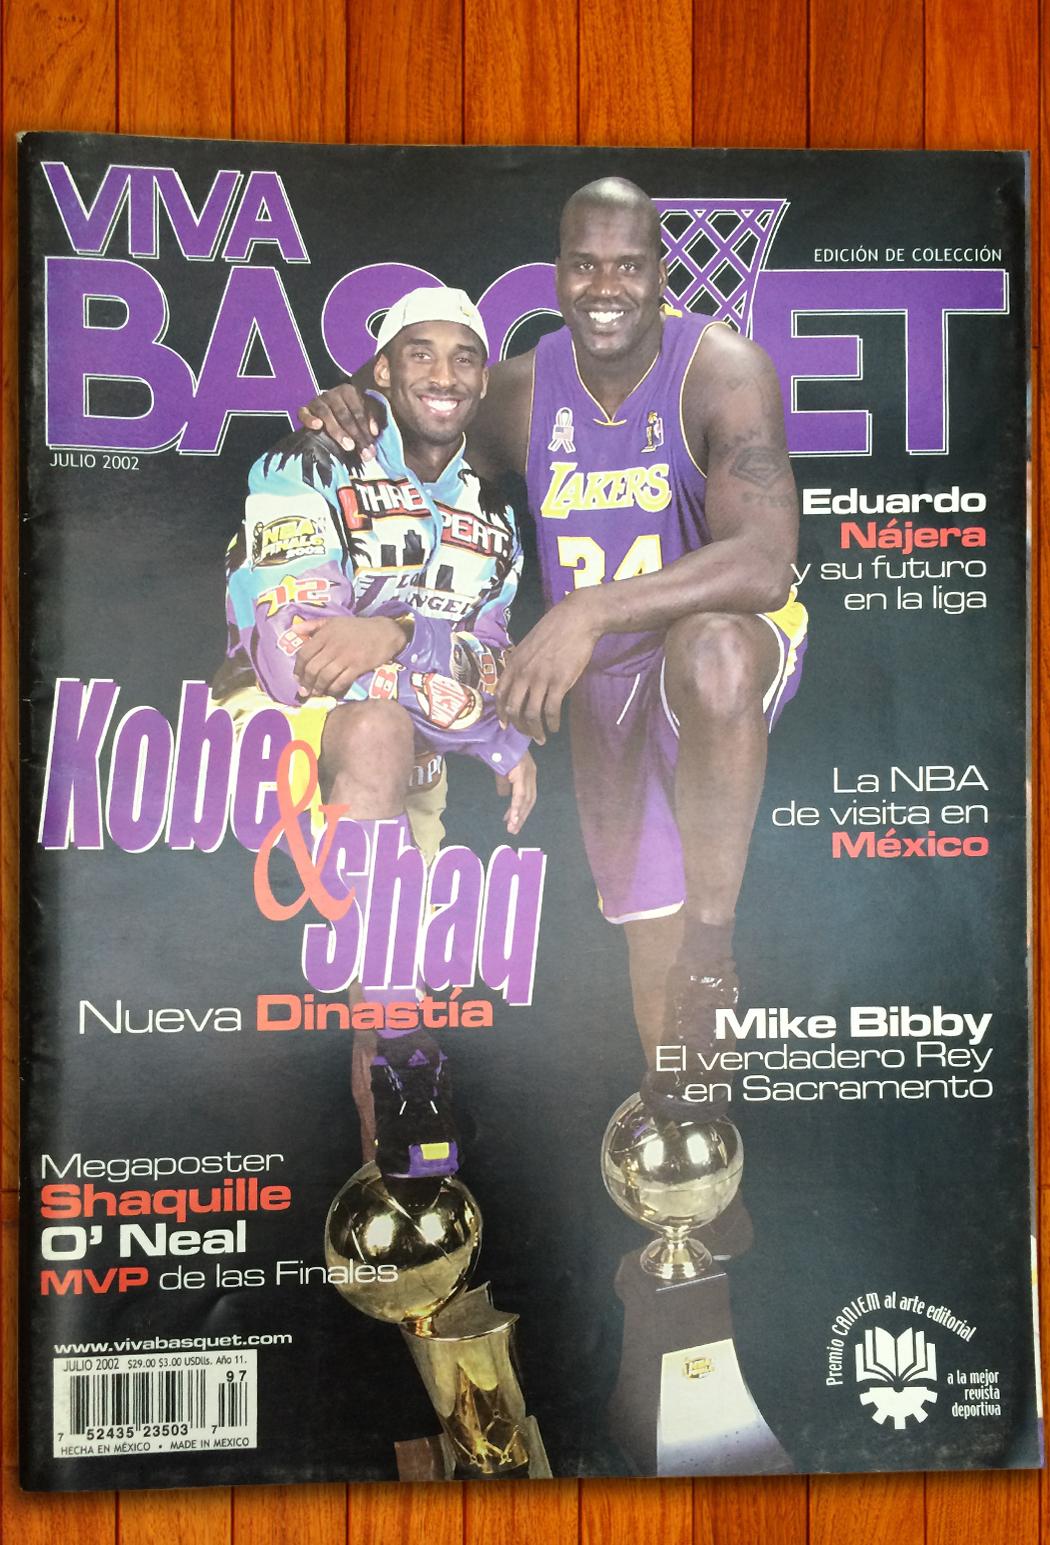 Kobe Bryant en viva basquet foto 5